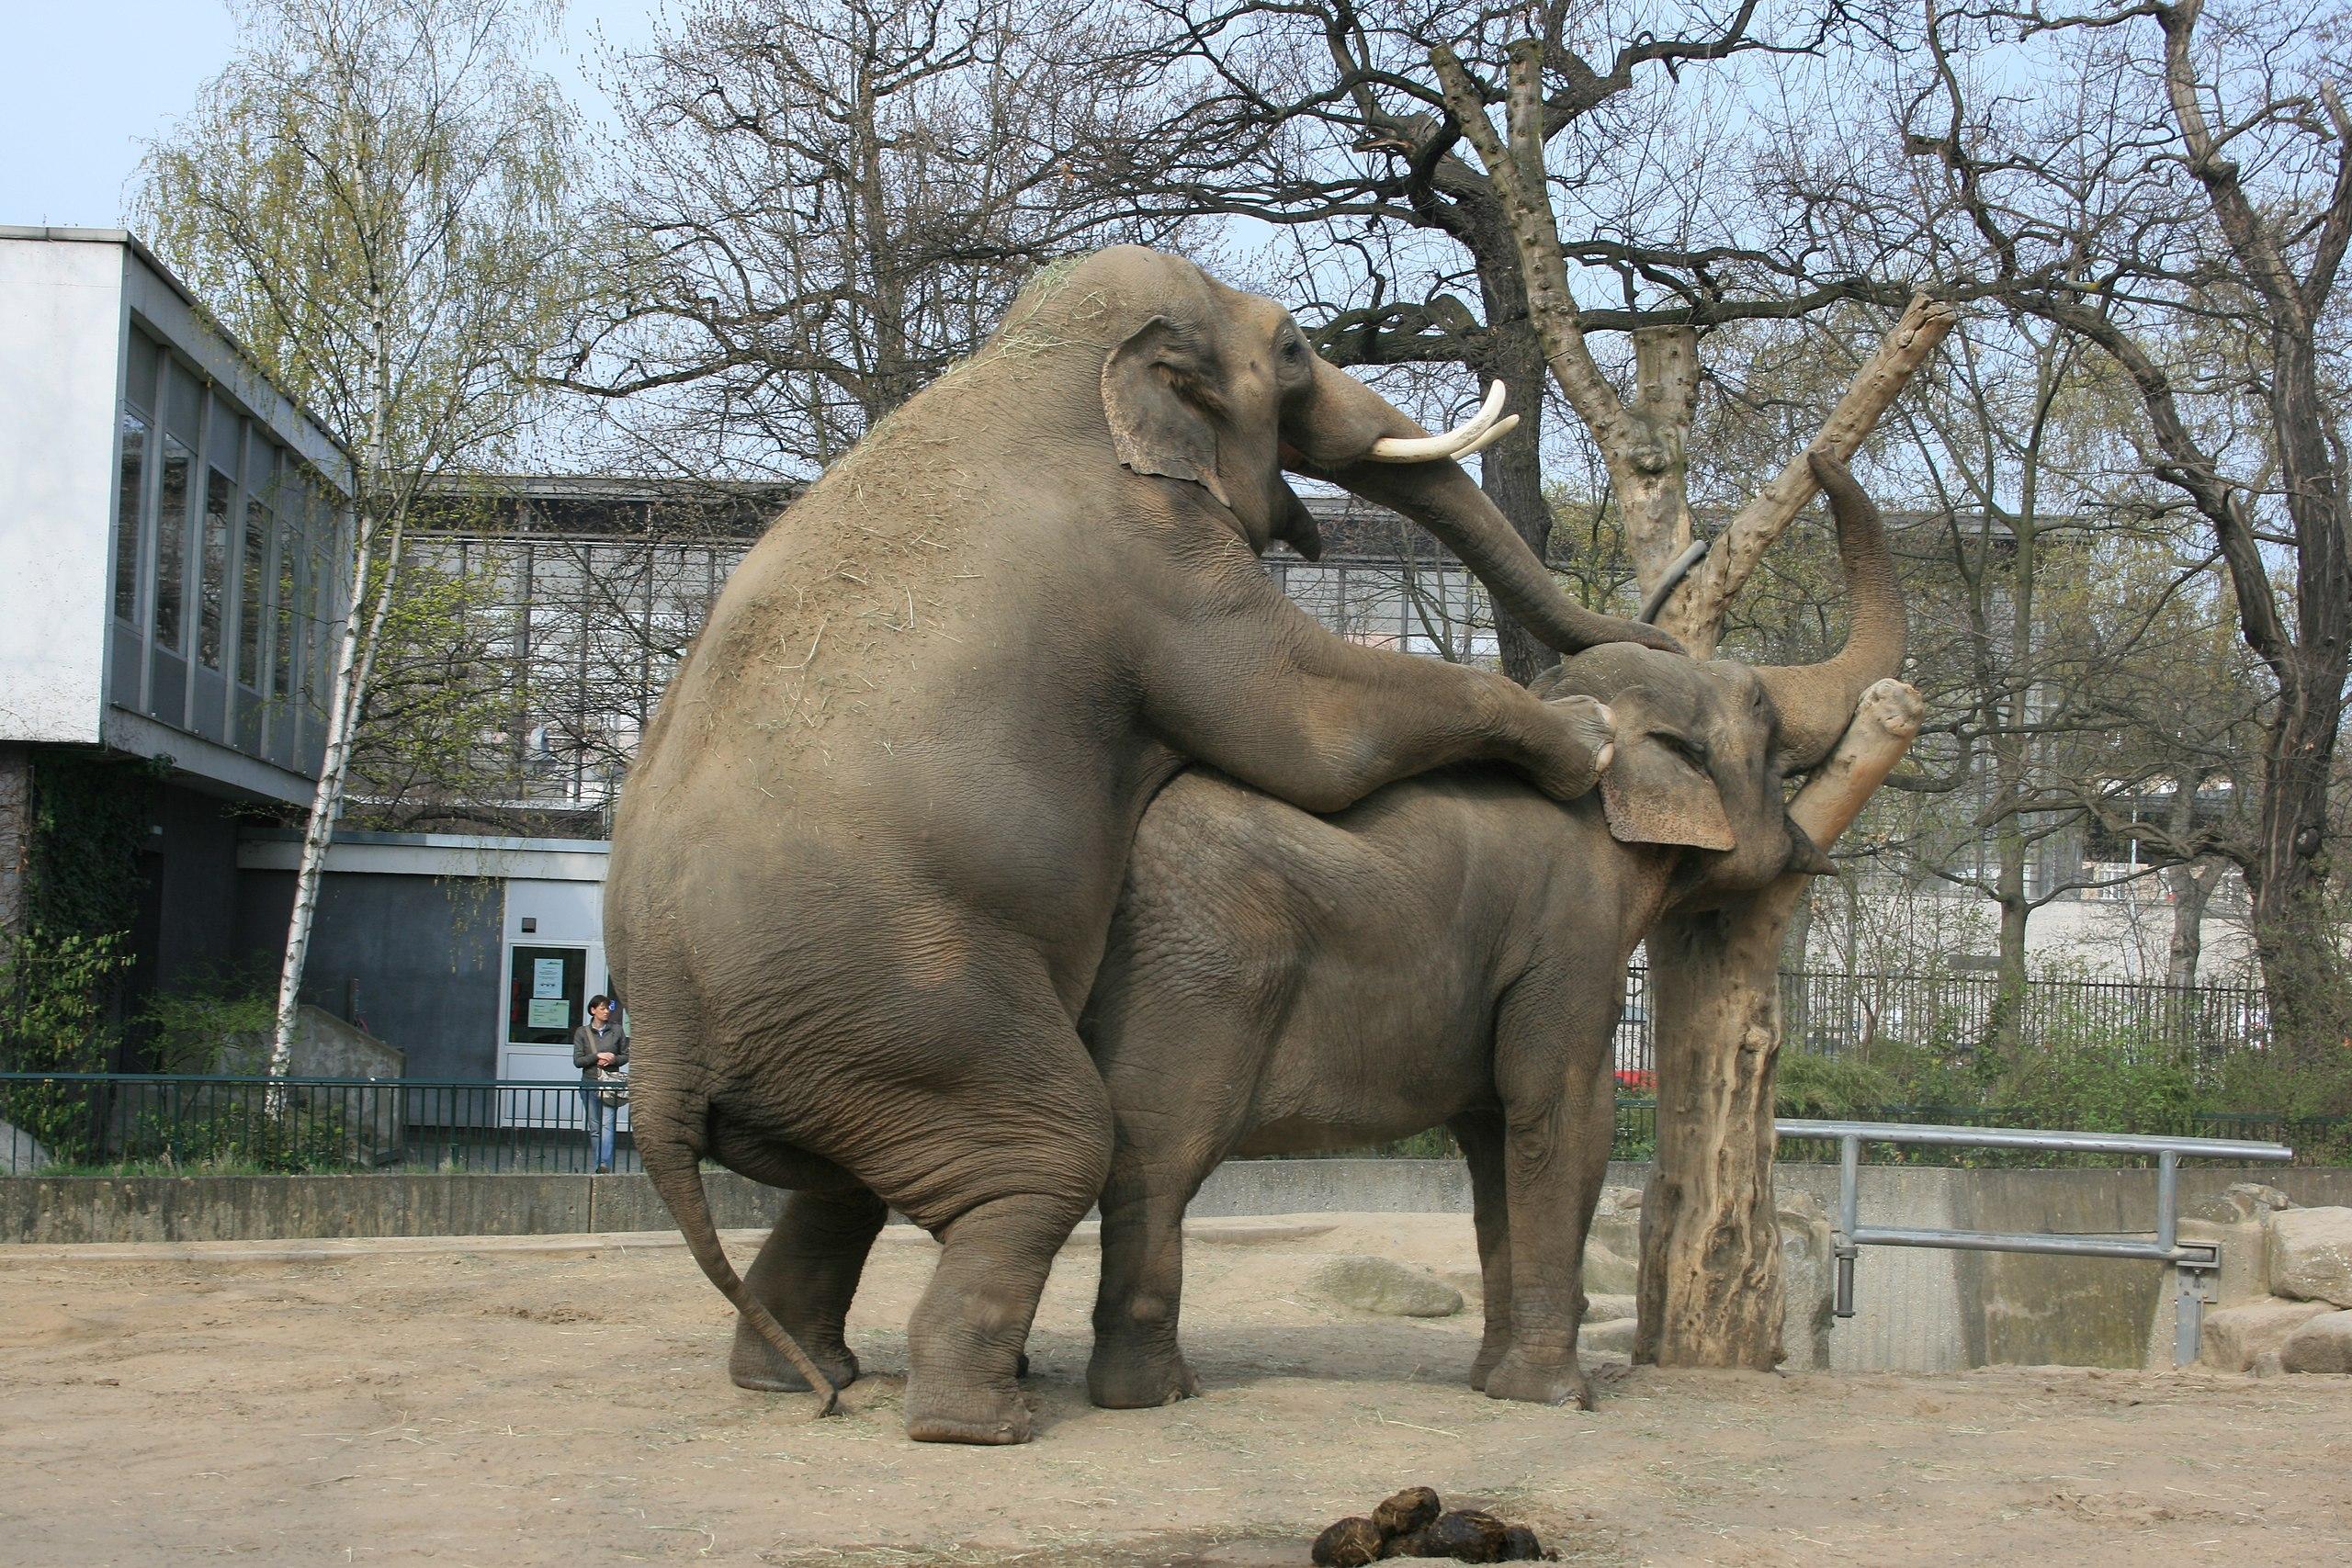 Elephan sex